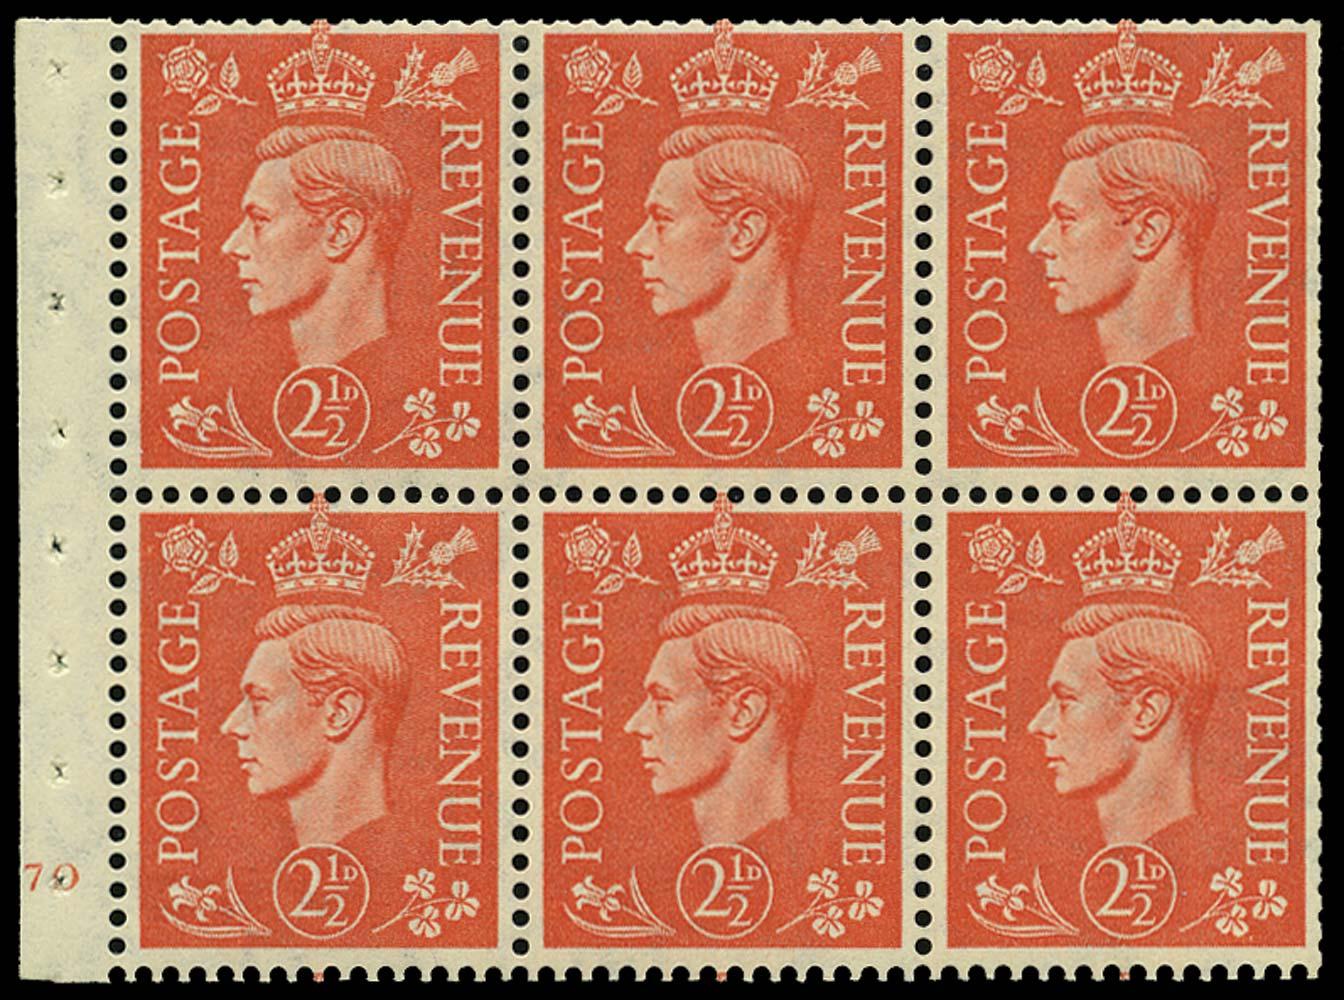 GB 1951  SG507c Booklet pane J70 (no dot)